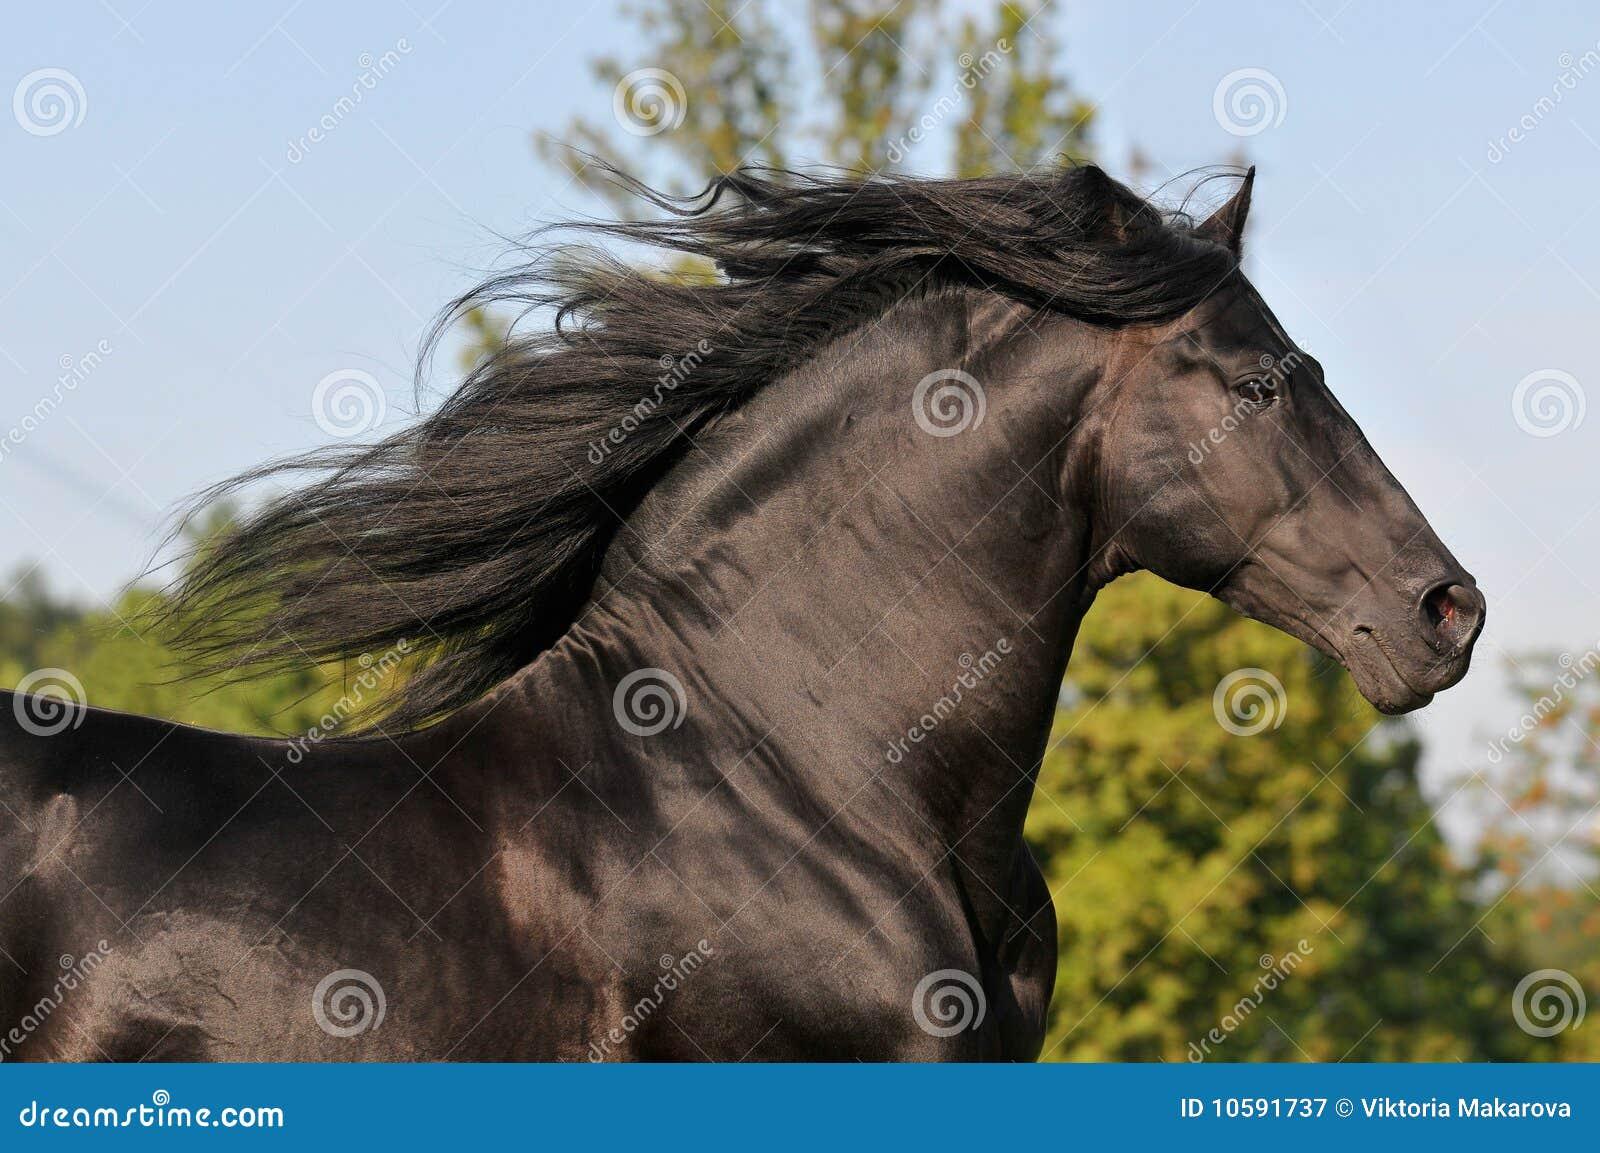 The free black horse run gallop